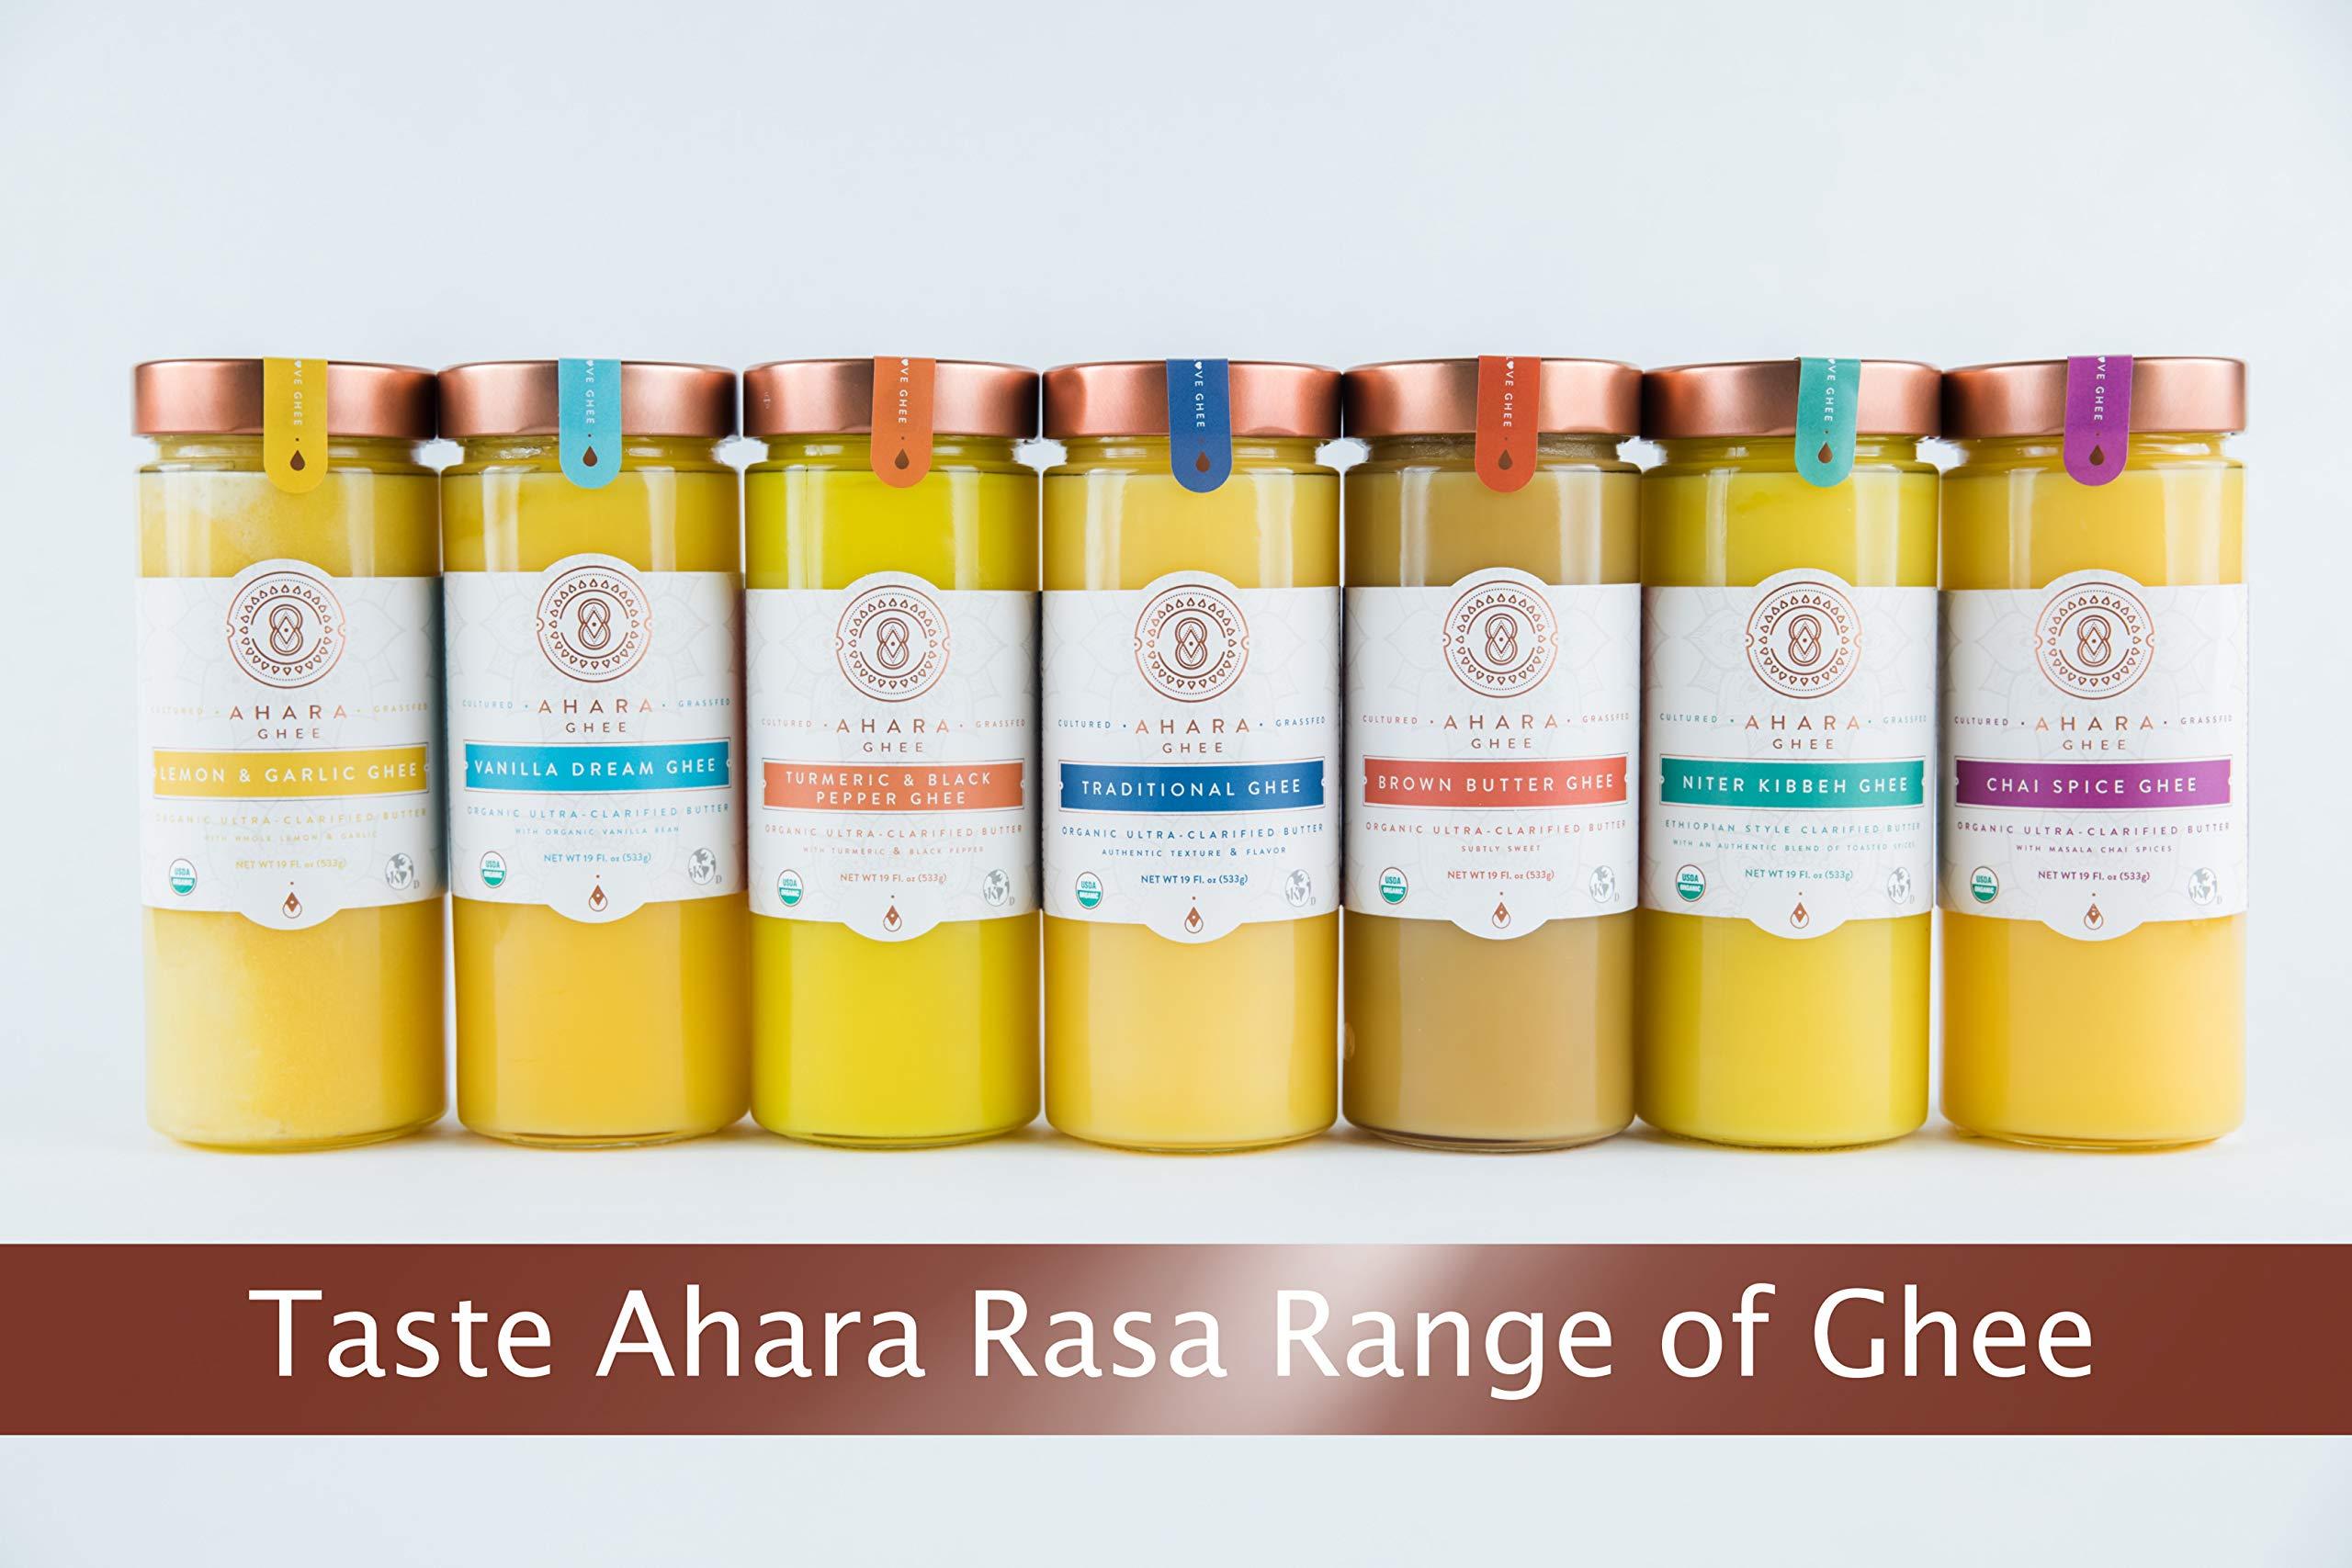 Ahara Rasa Lemon Garlic Organic Ghee 19oz, 100% Organic. Lactose & Casein Free USDA & Kosher Certified. No Salt, No GMOs. Made in USA by Ahara (Image #4)